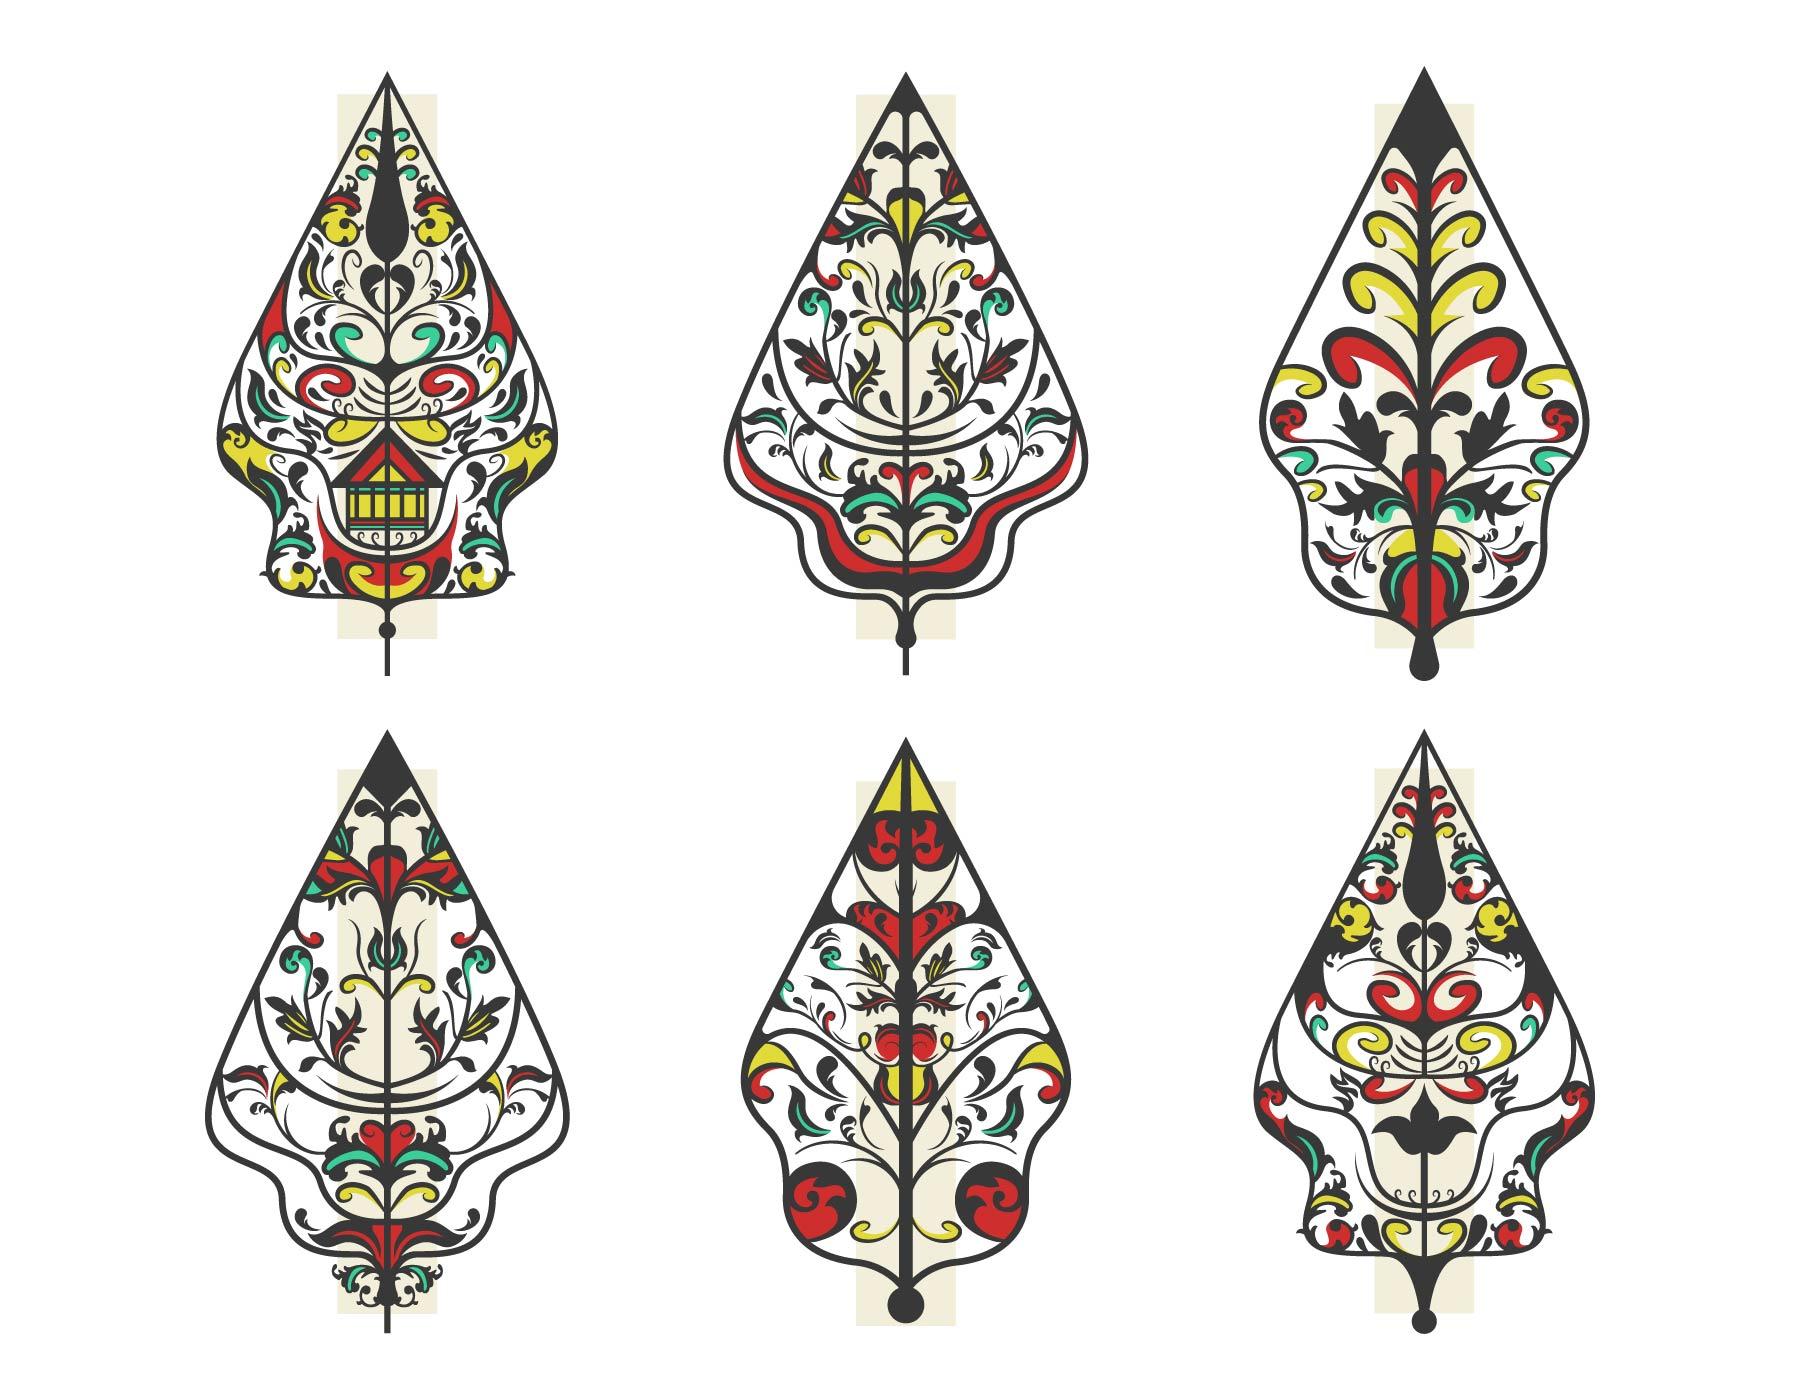 gunungan wayang vector collection download free vectors clipart graphics vector art gunungan wayang vector collection